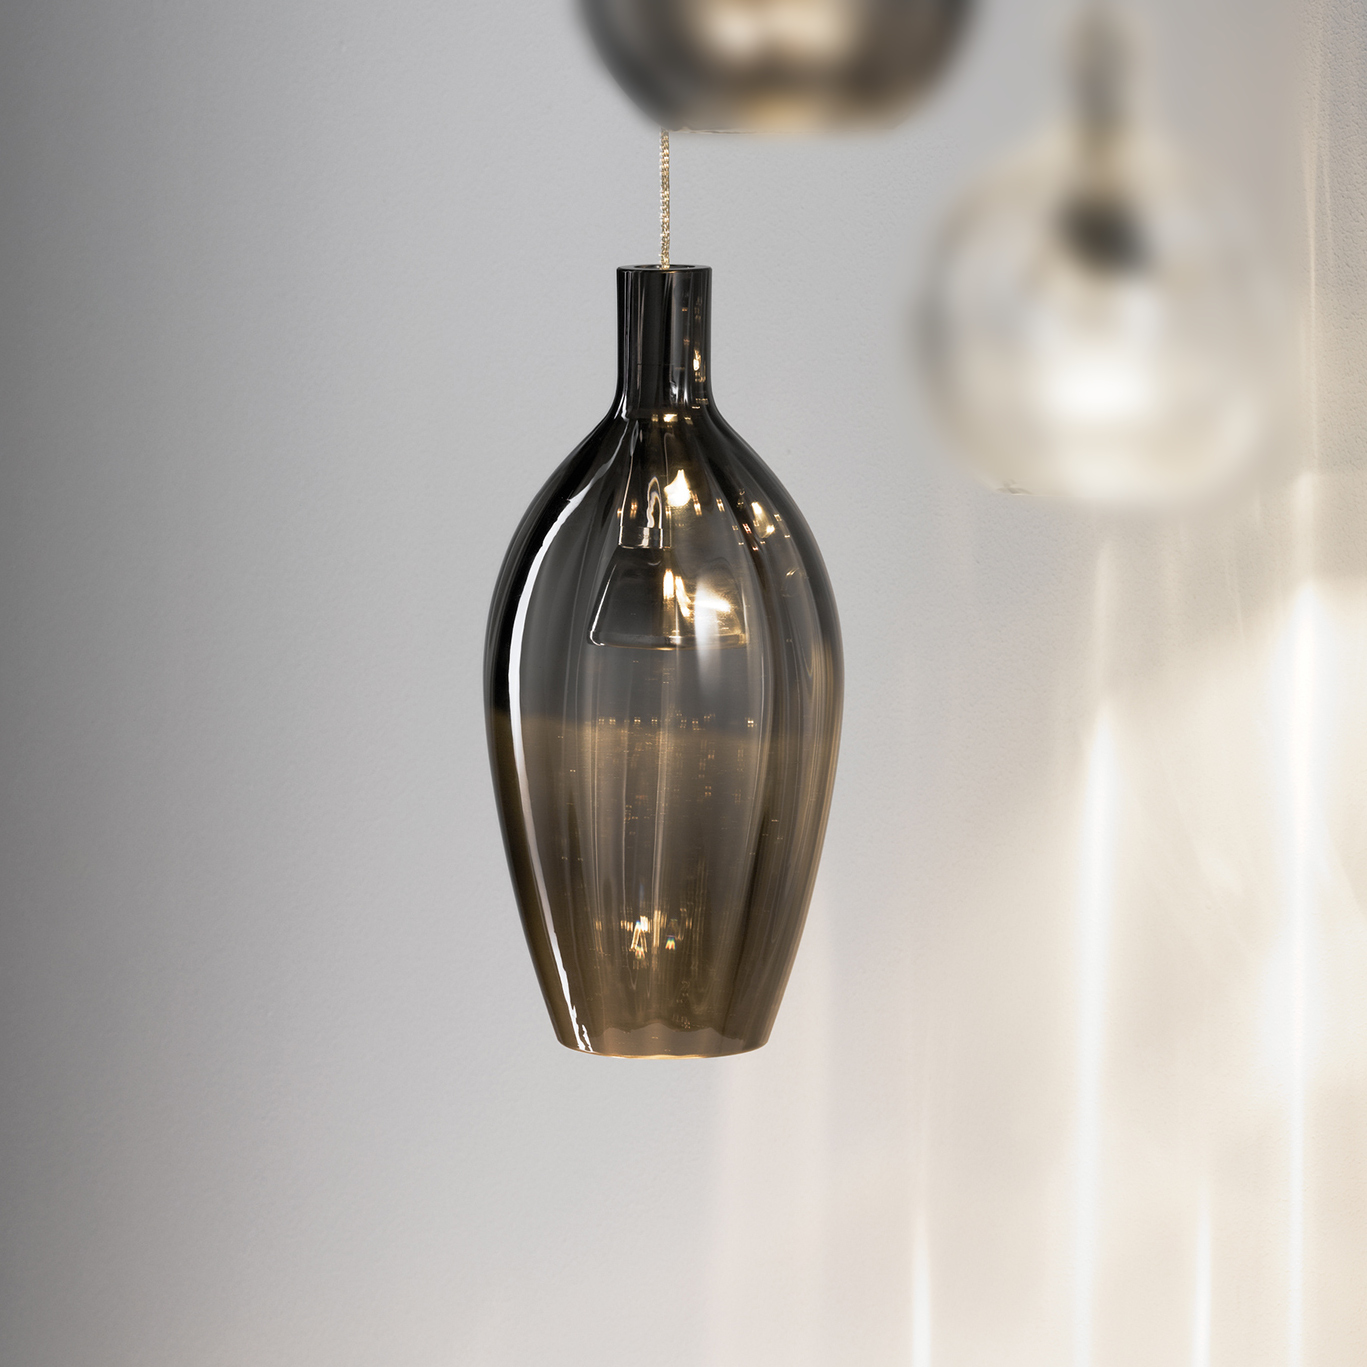 Gloria 'O' Pendant Light in Olivenform